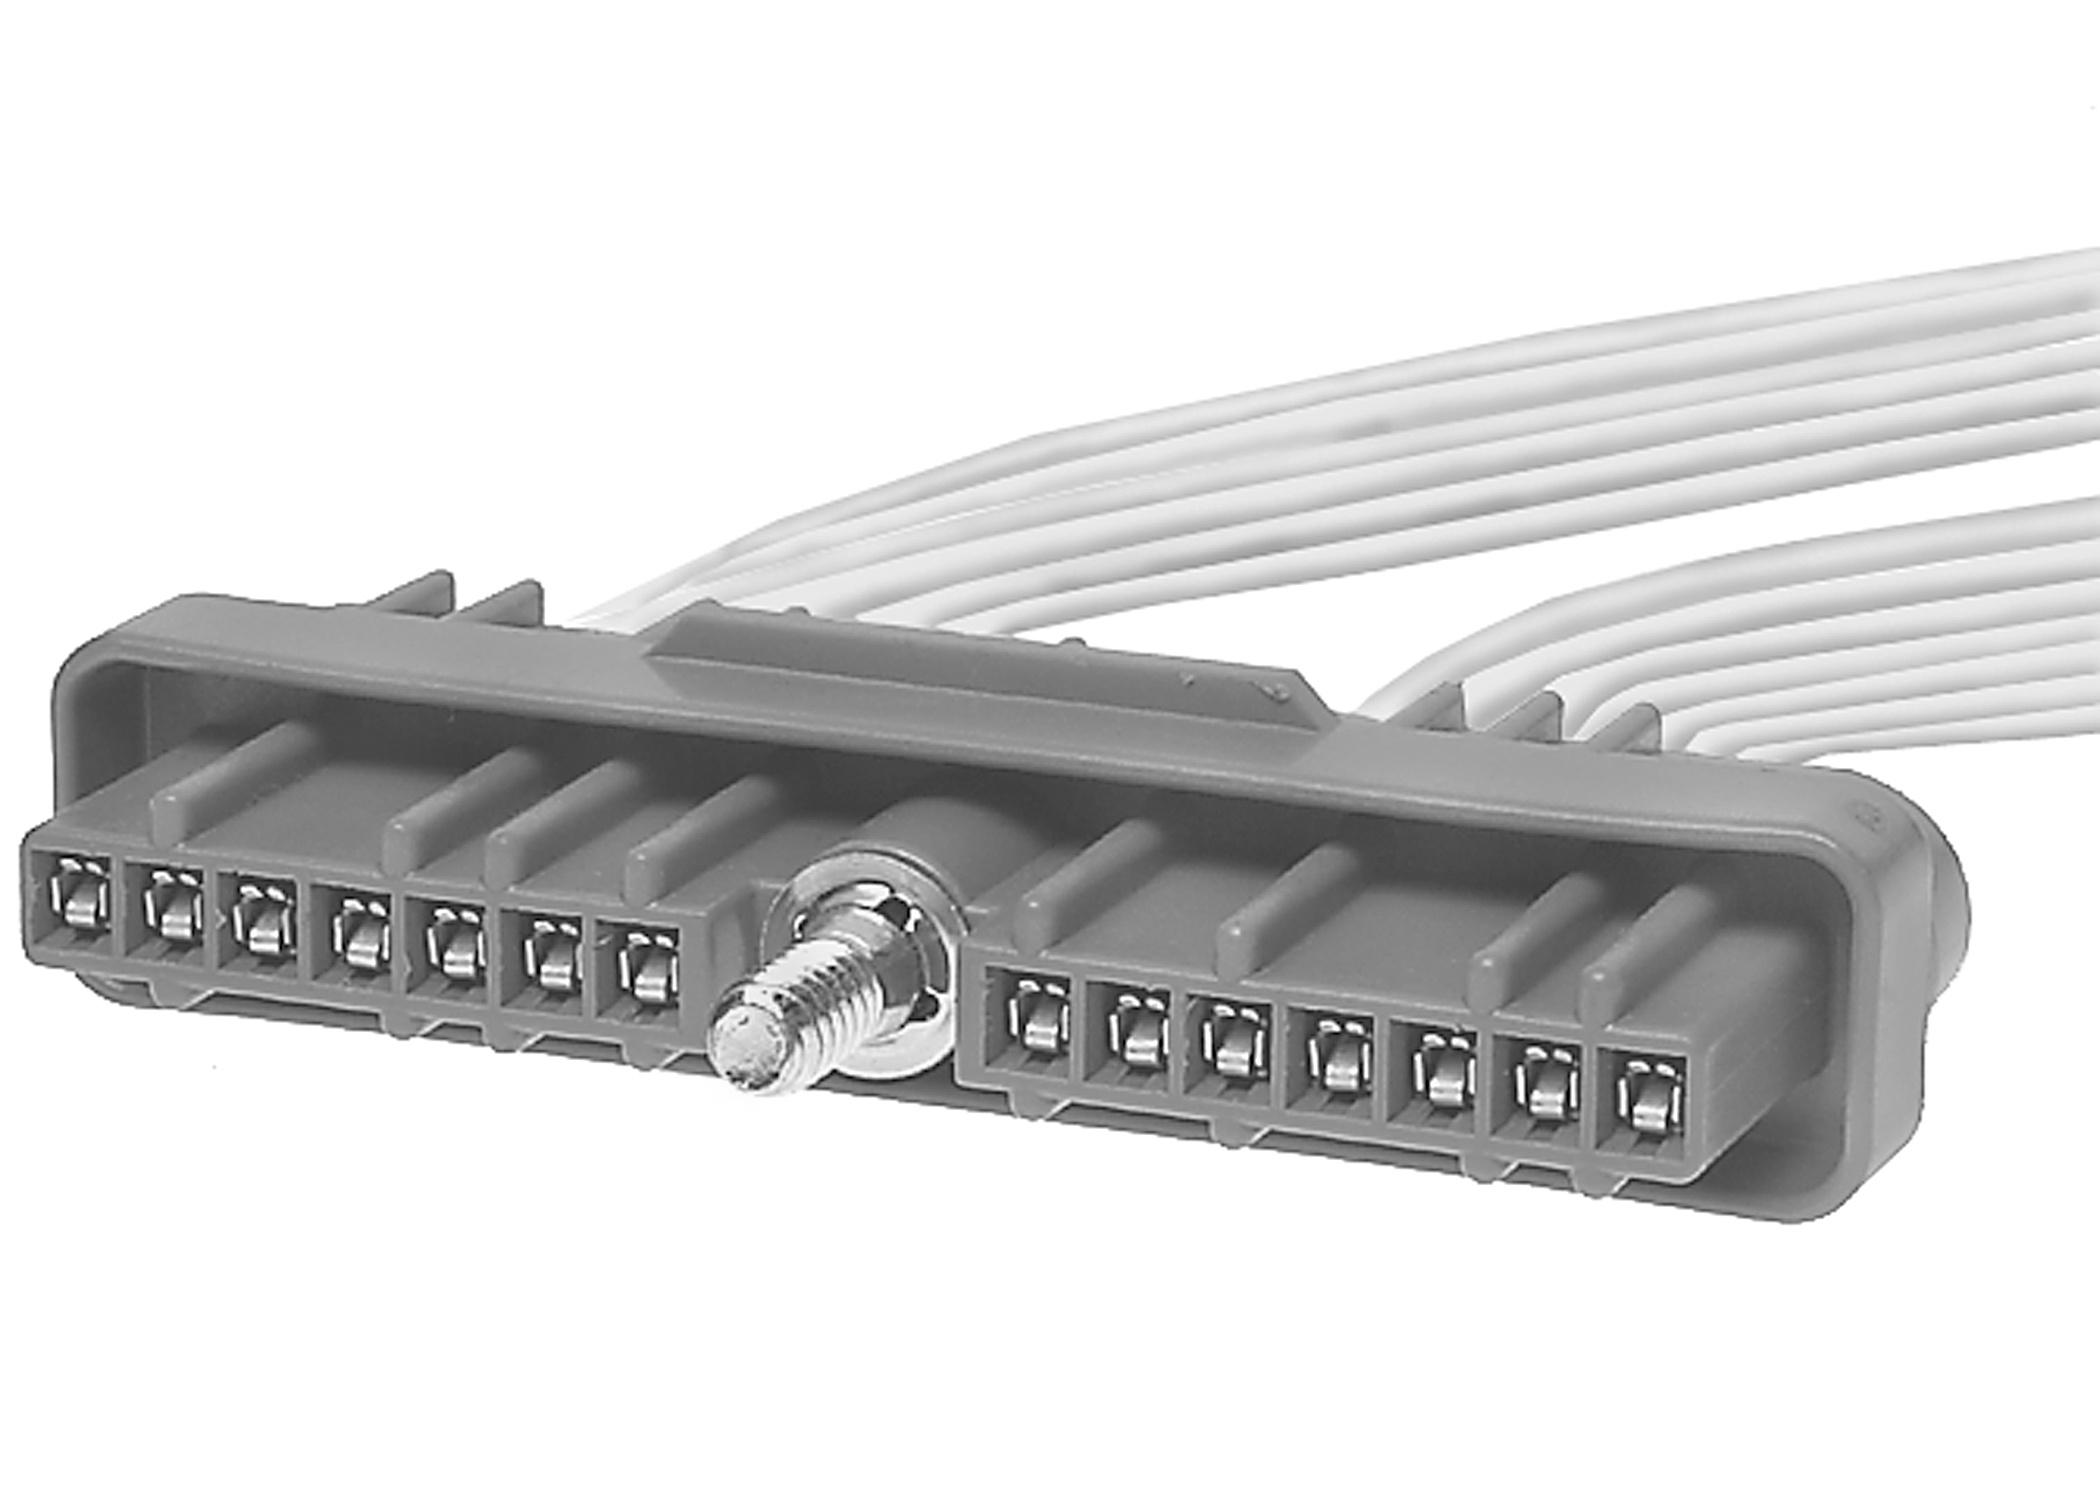 ACDELCO OE SERVICE CANADA - Module-Electronic Ignition Control Conn - DCG PT789